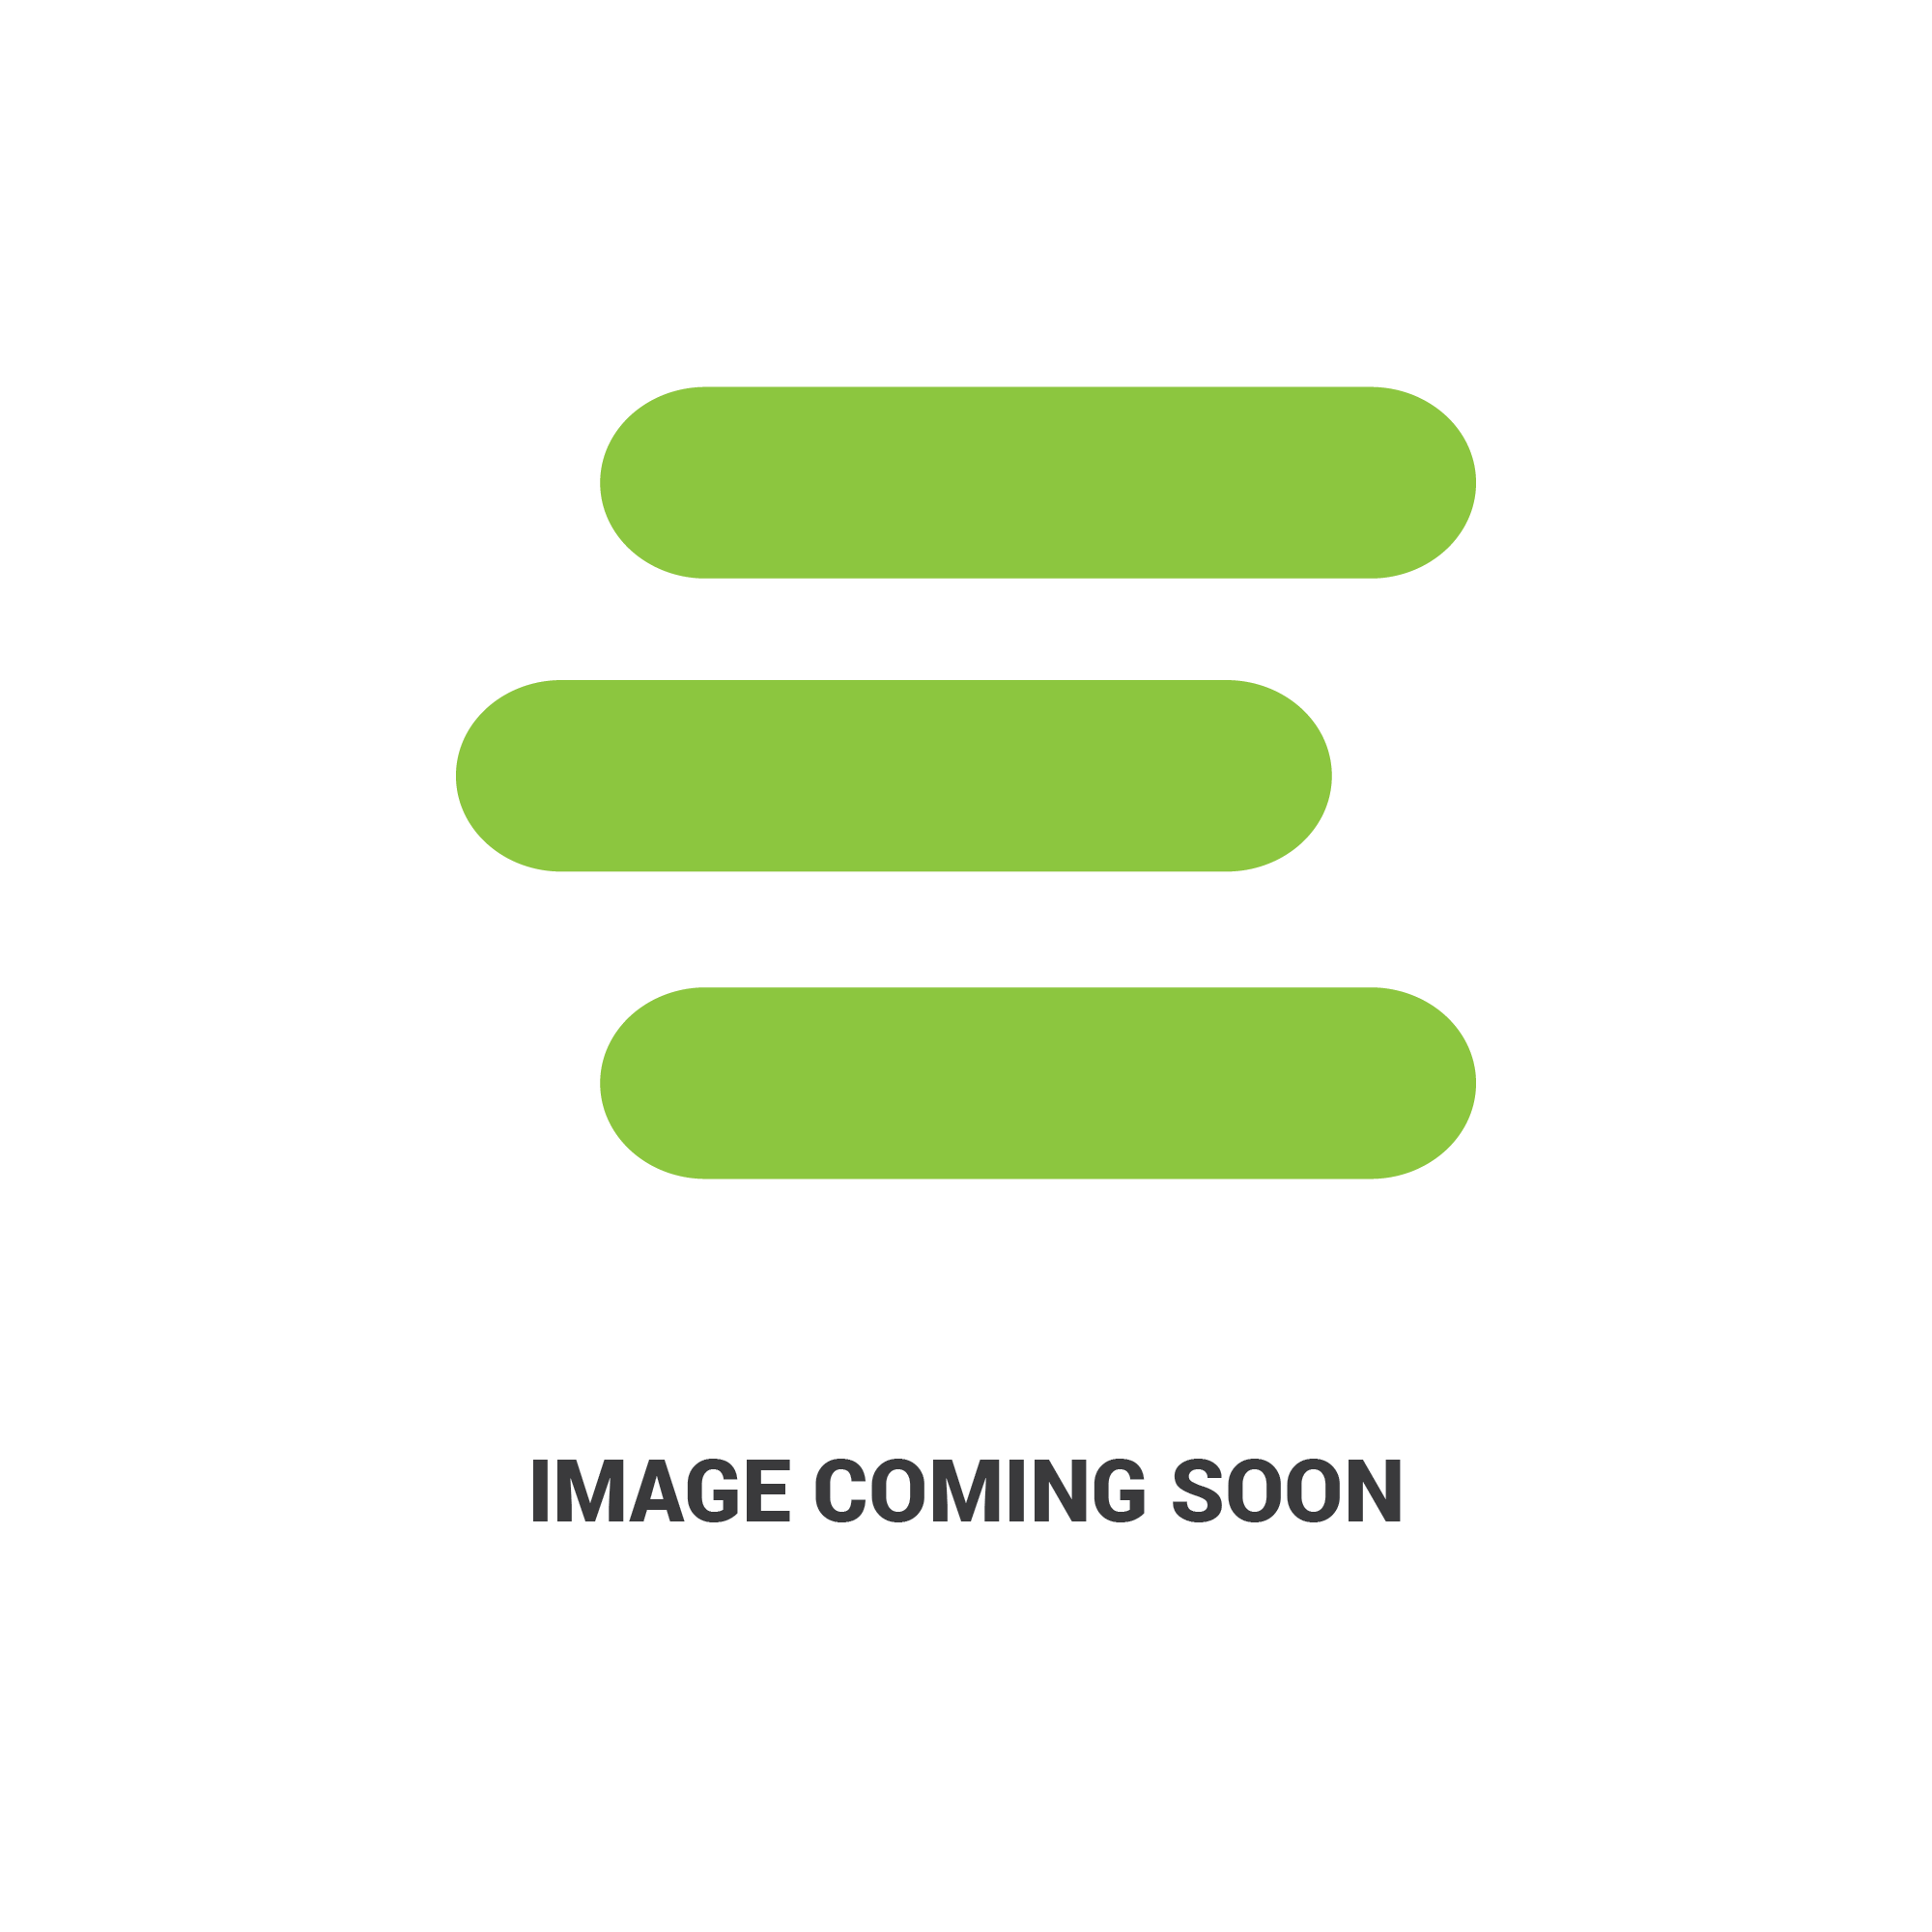 E-83952266edit 1165.jpg